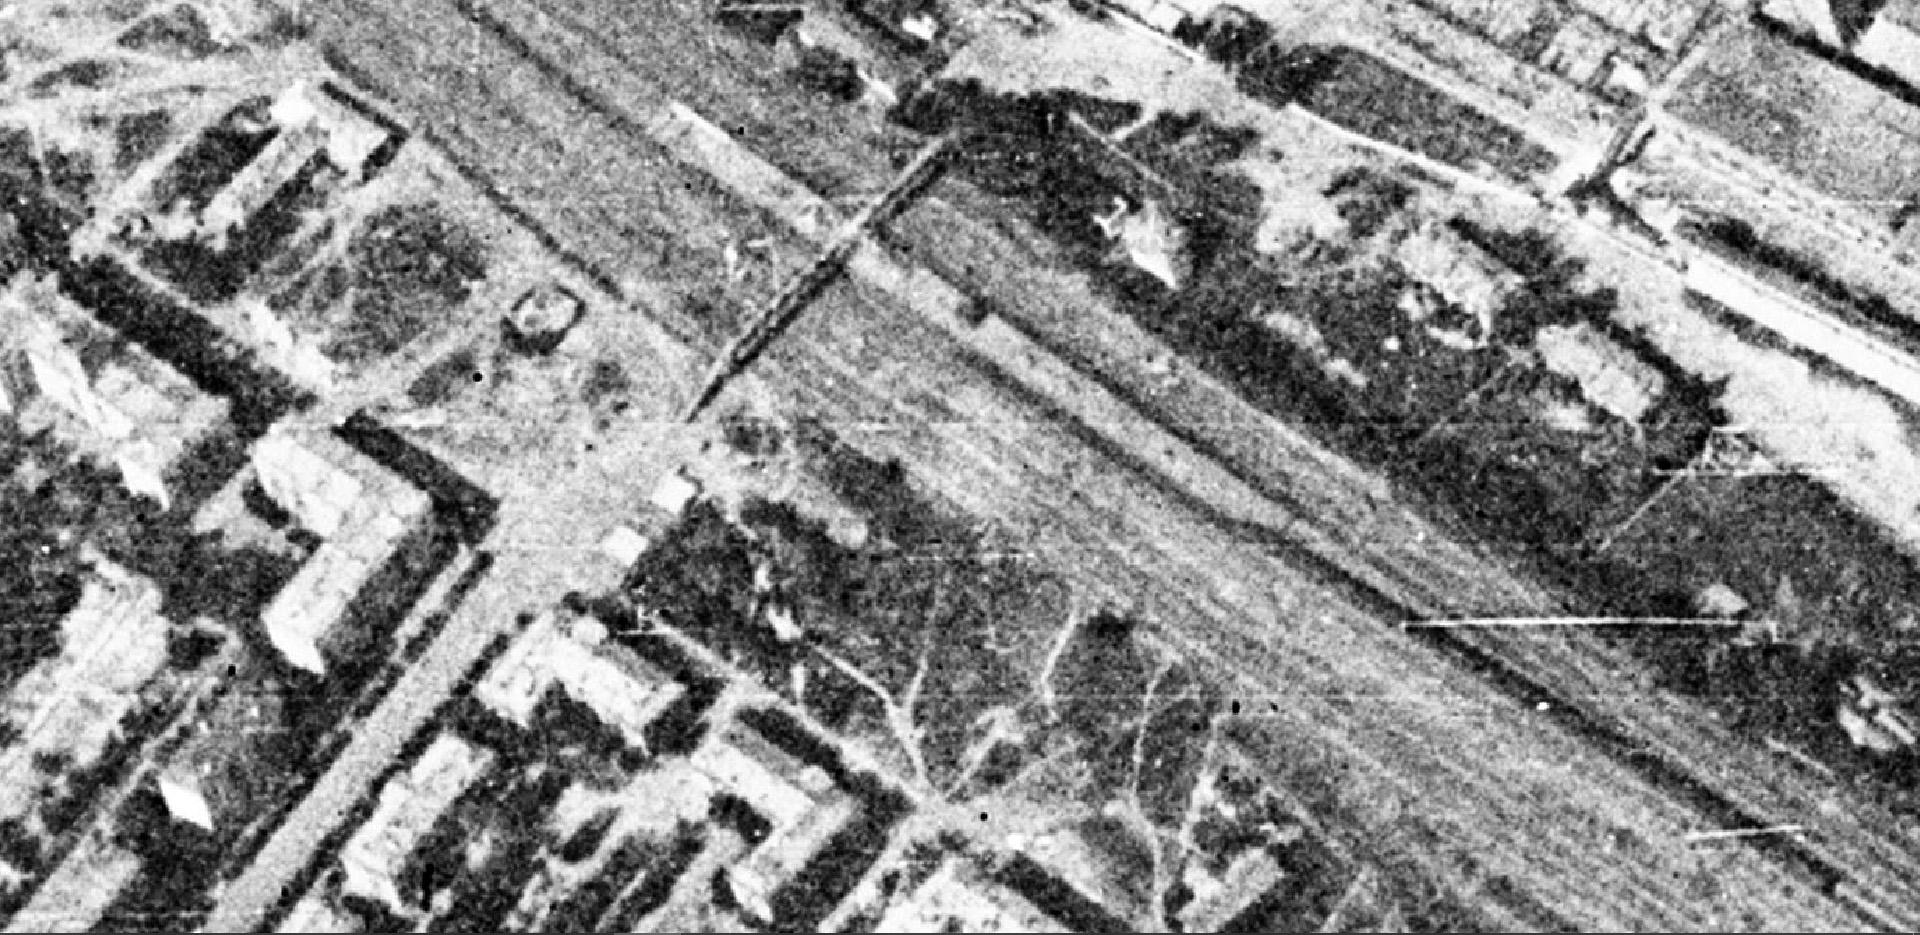 1966 станция Очаково со спутника